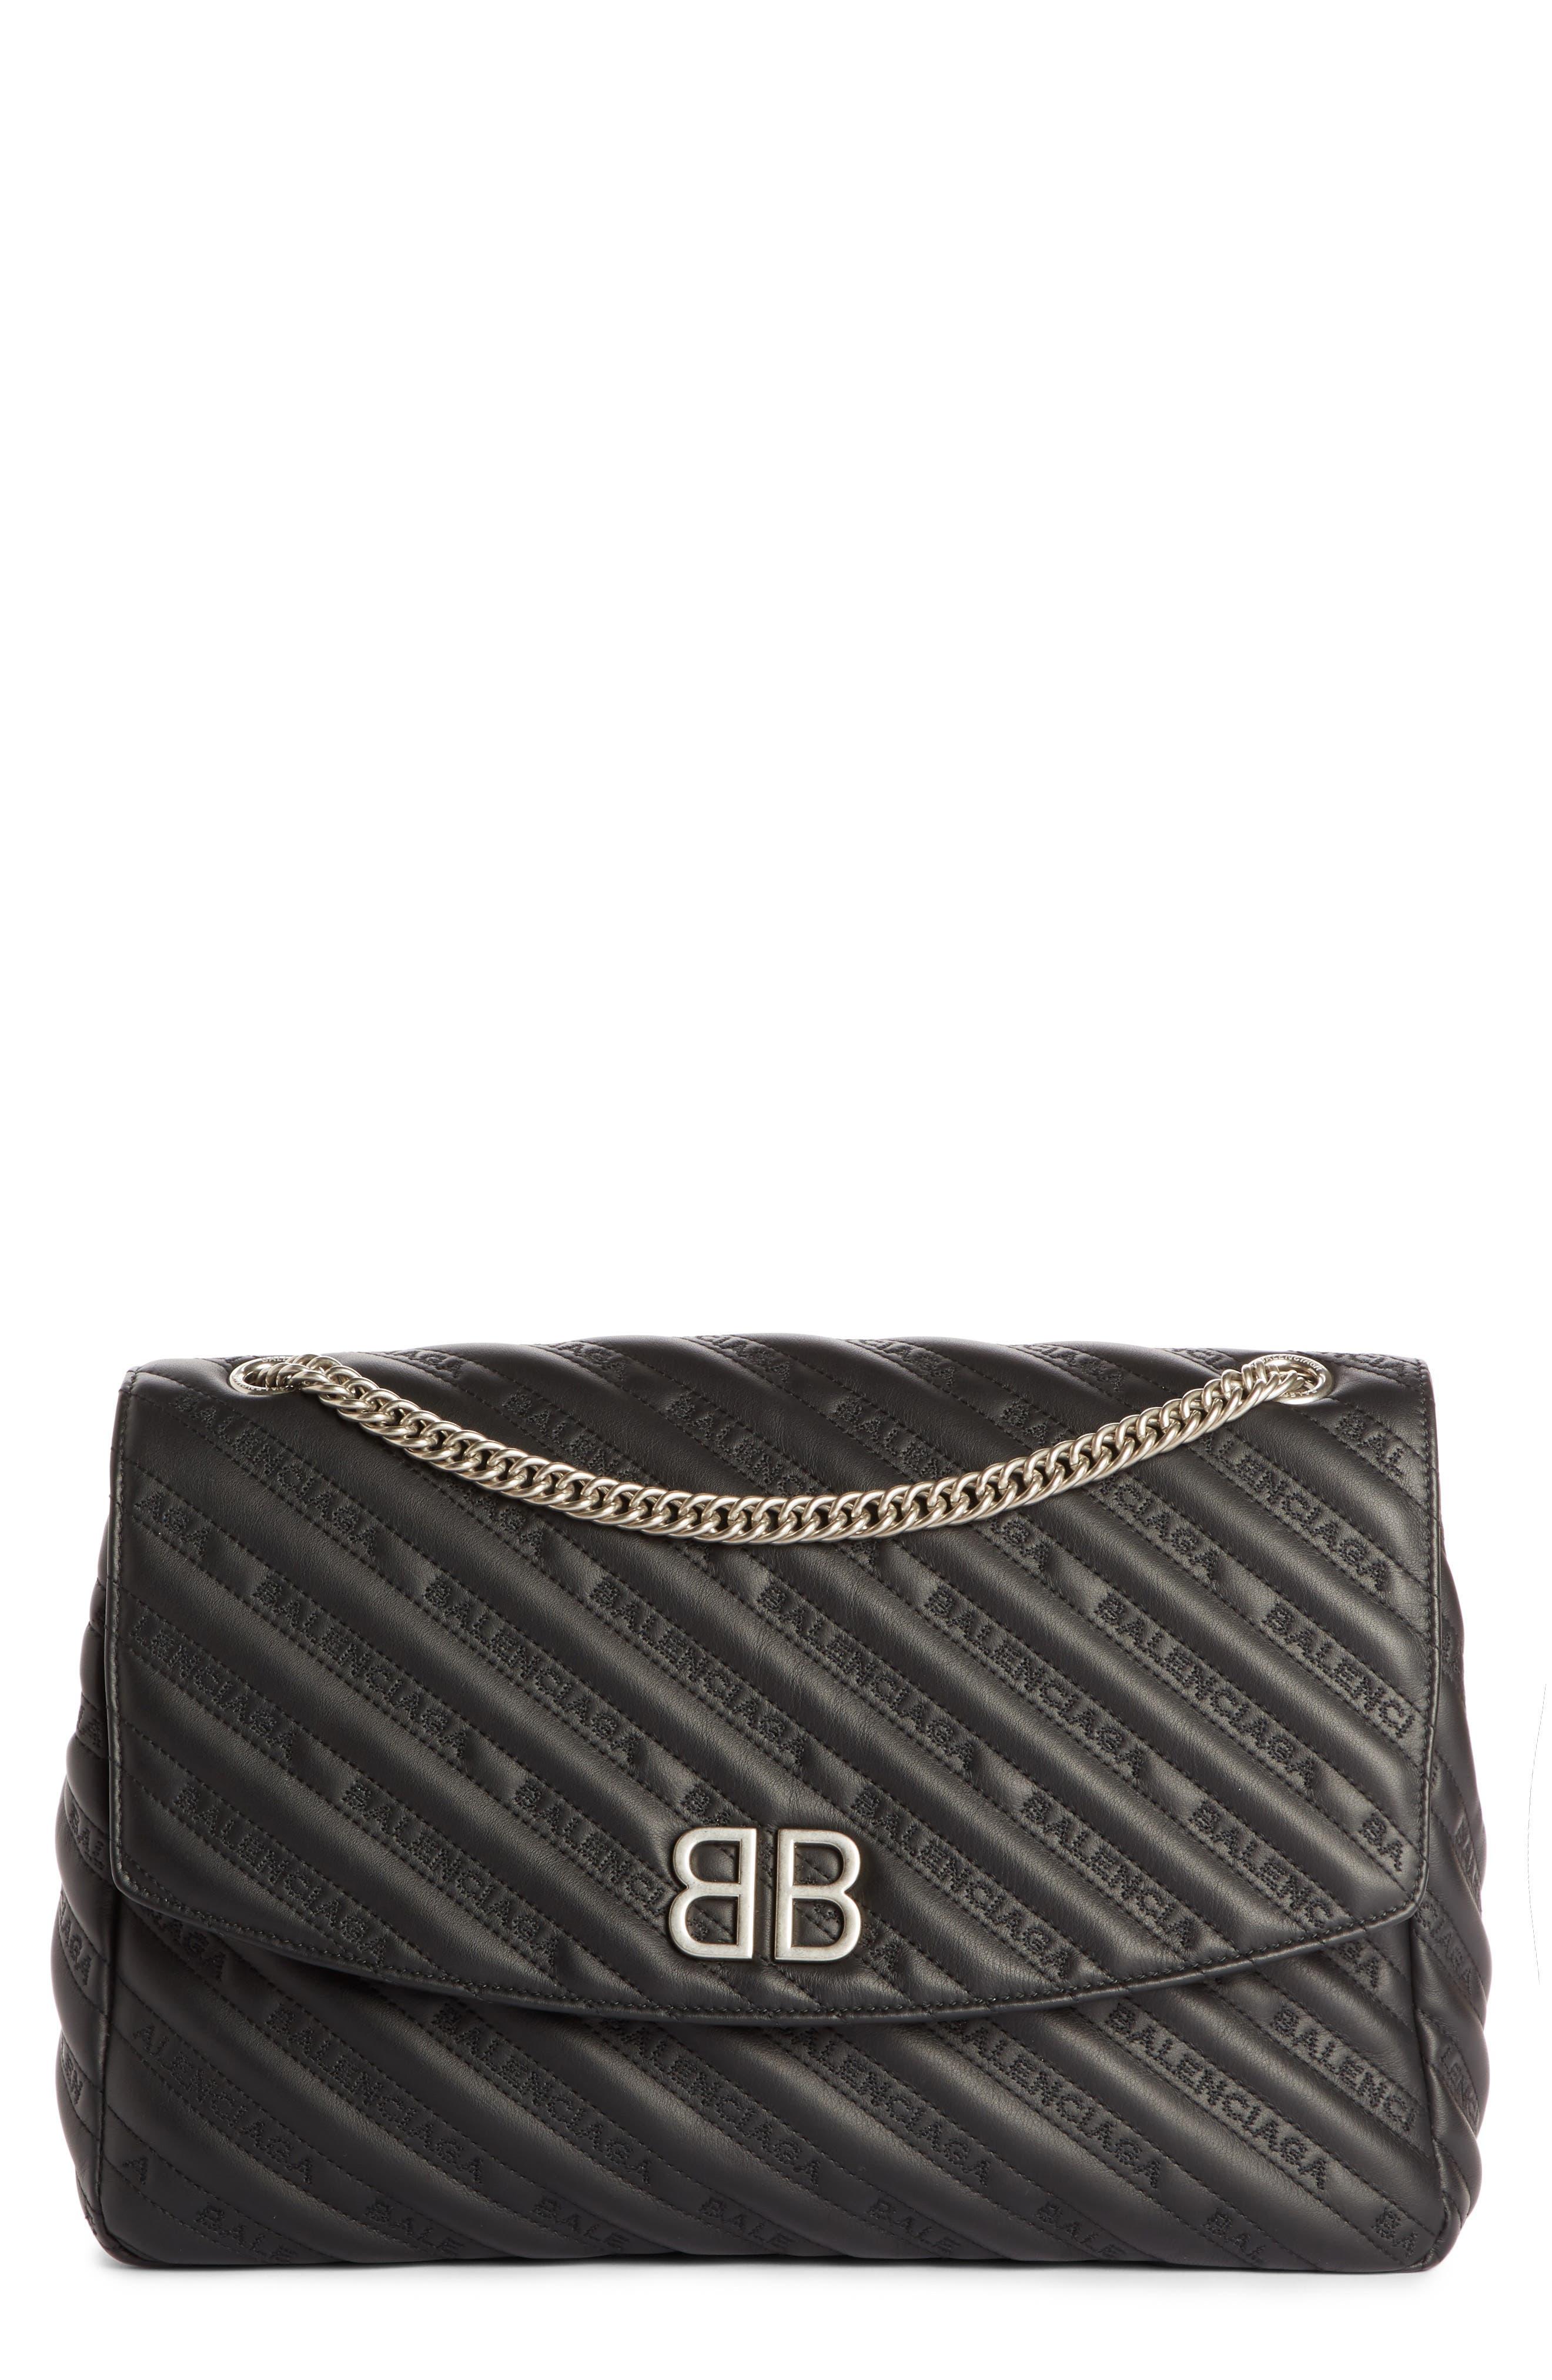 Balenciaga Large BB Round Leather Shoulder Bag